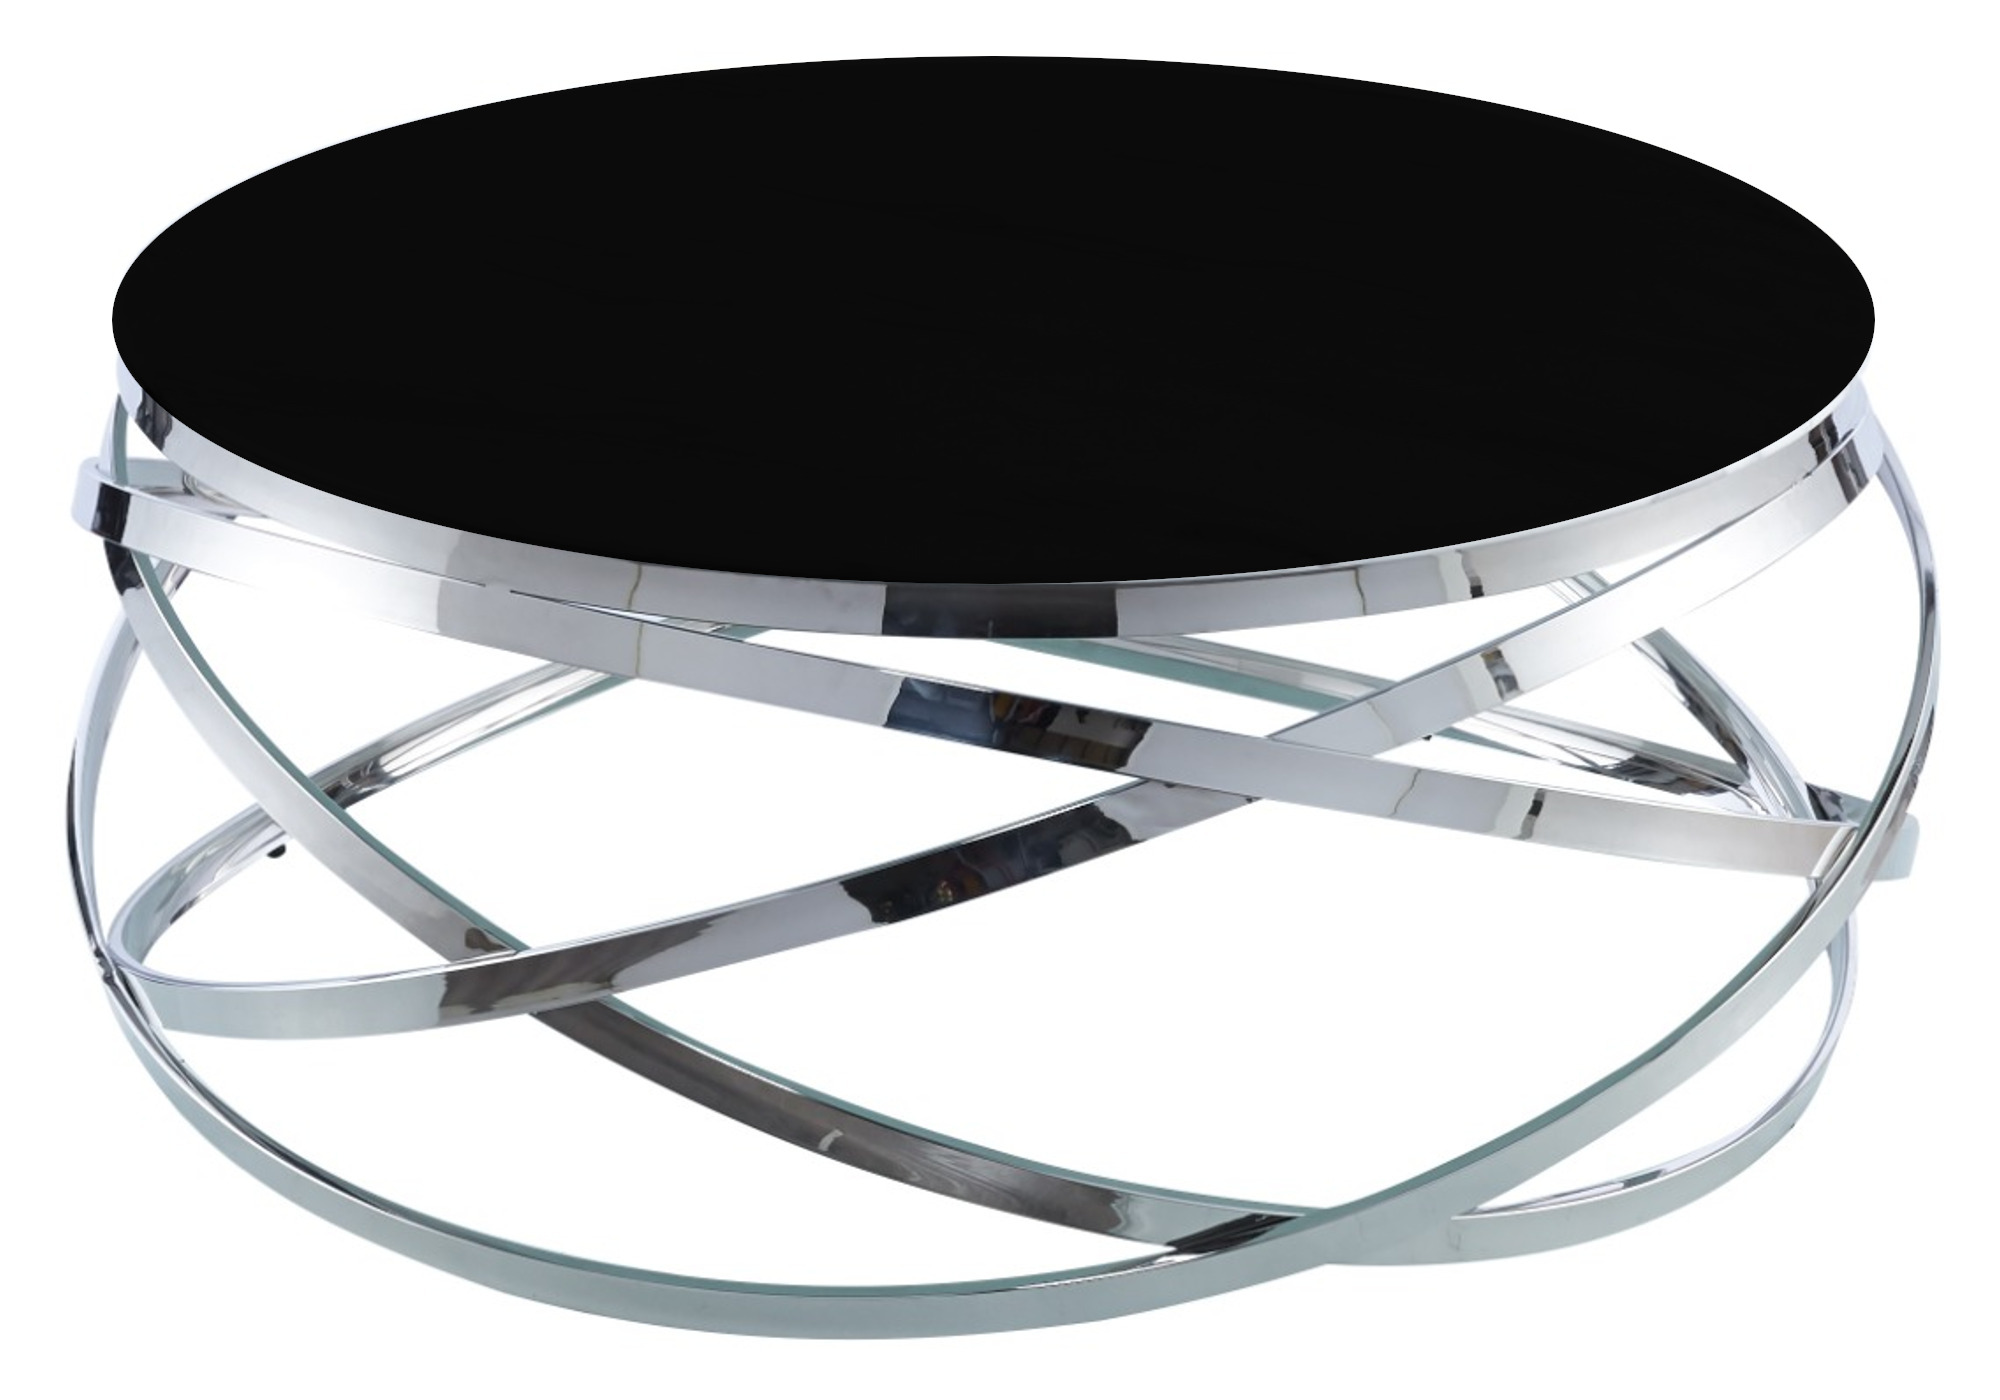 Table basse design chromé noir EVO